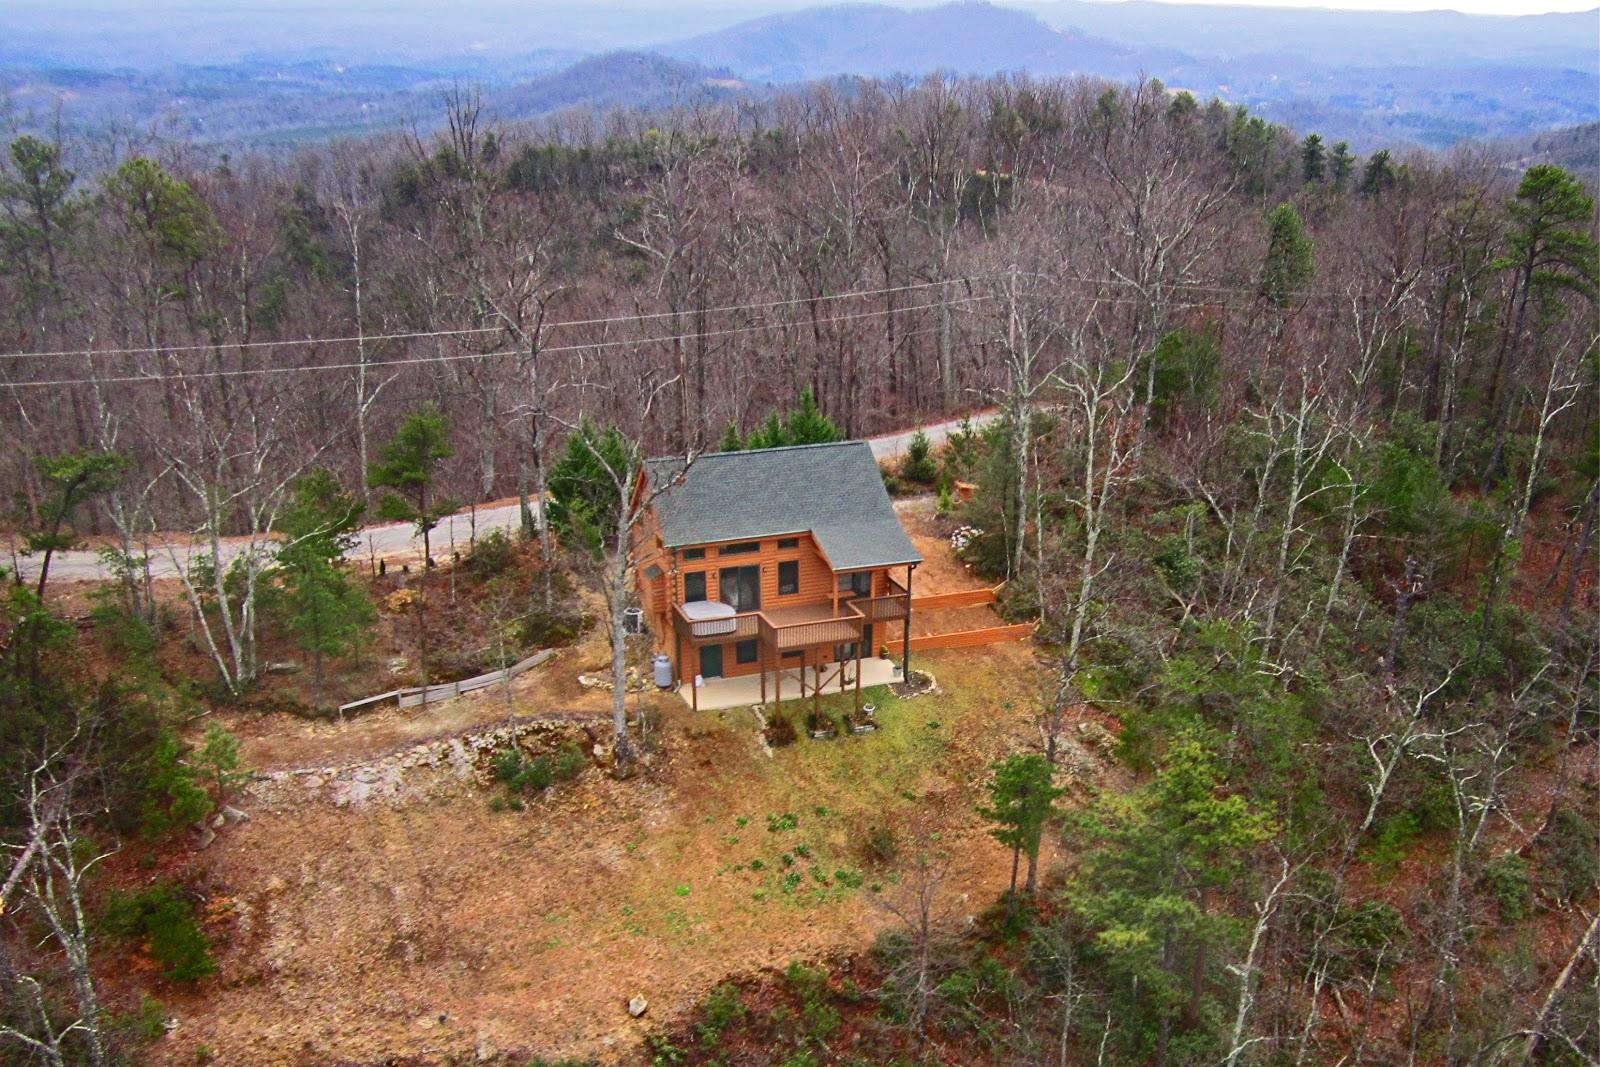 rock rentals chimney best nc cabins als cabin